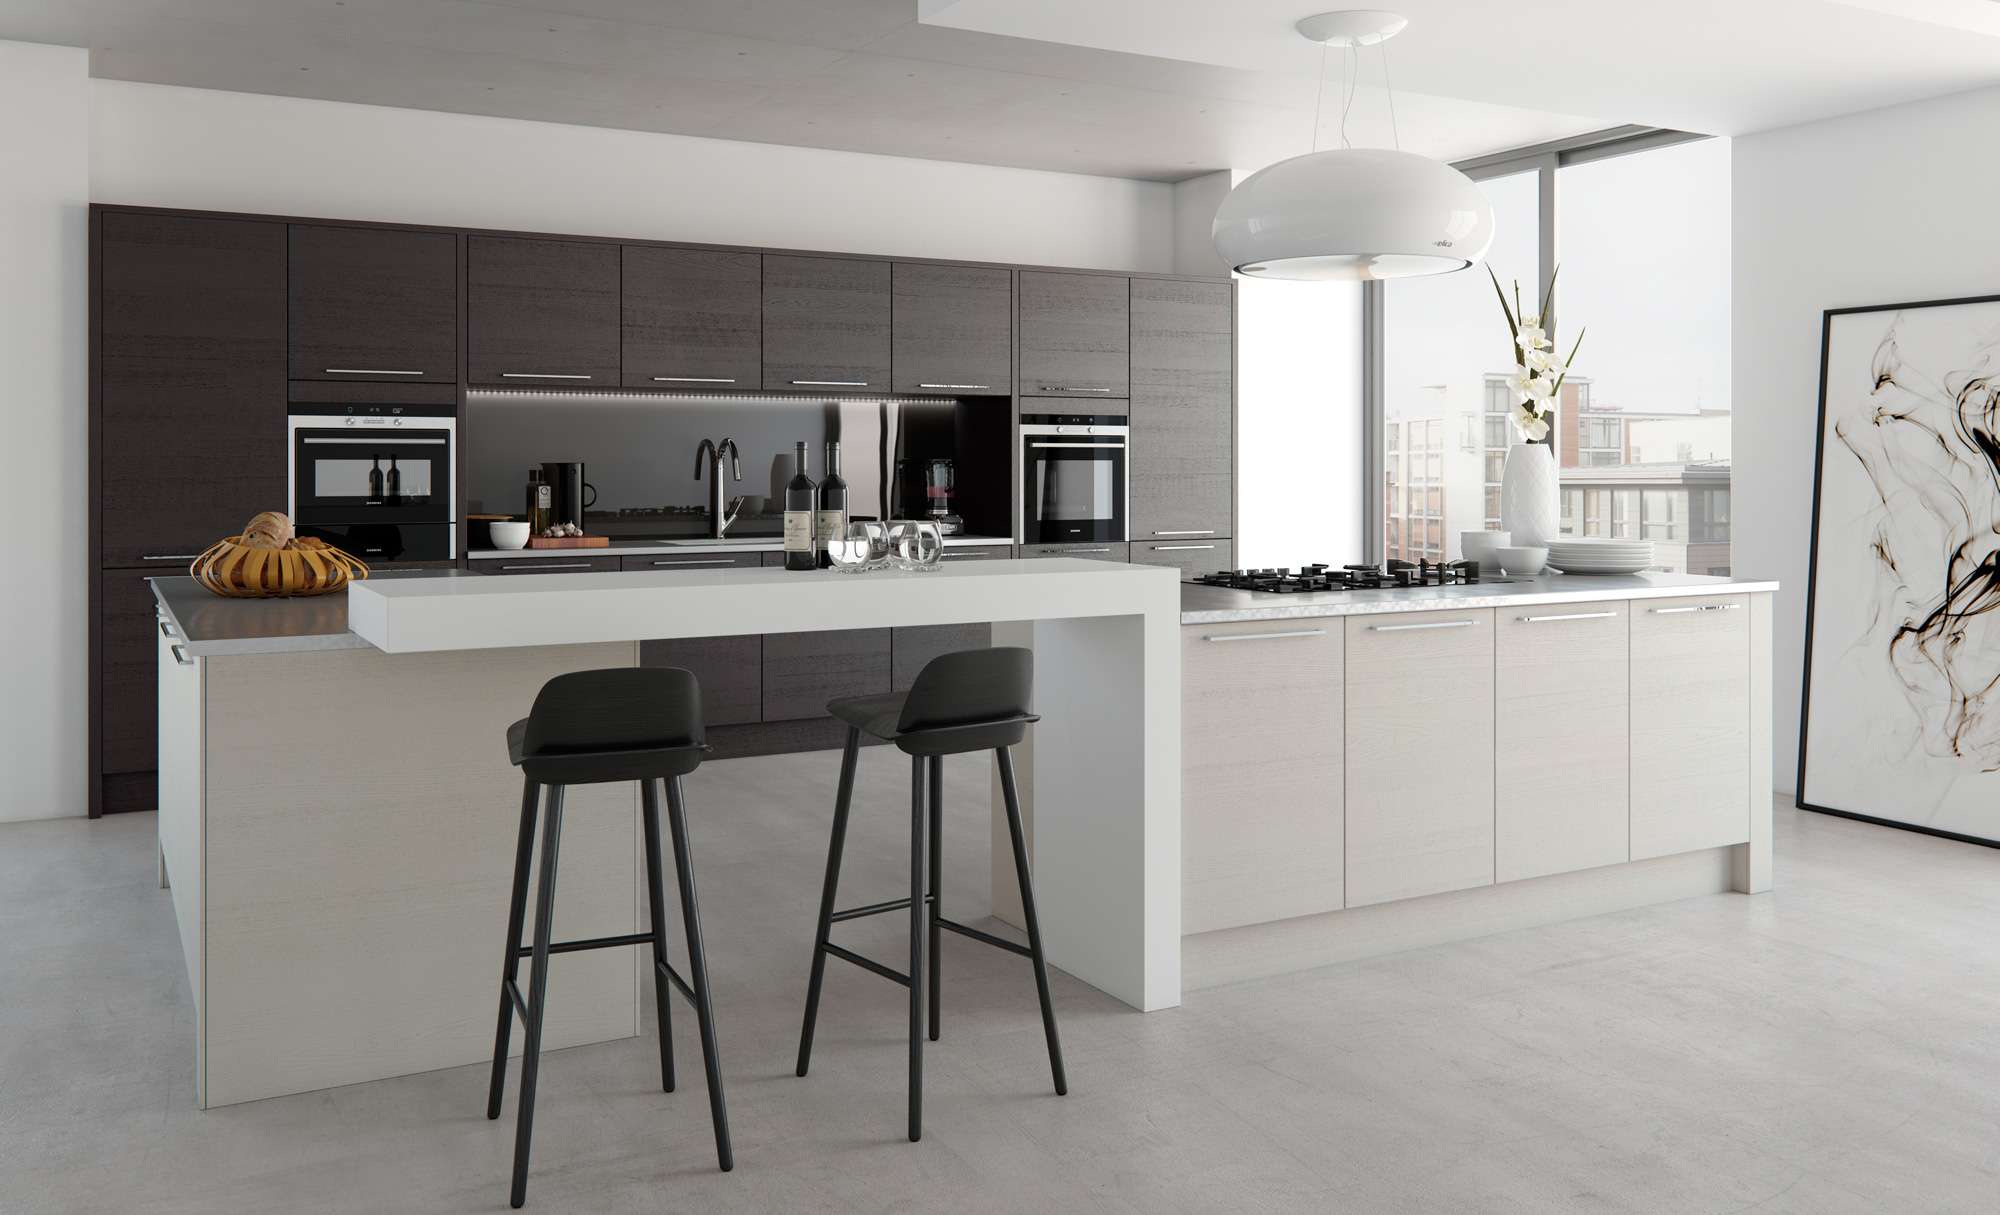 Modern Contemporary Tavola Stained Hacienda Black, Painted Light Grey Kitchen - Kitchen Design - Alan Kelly Kitchens - Waterford